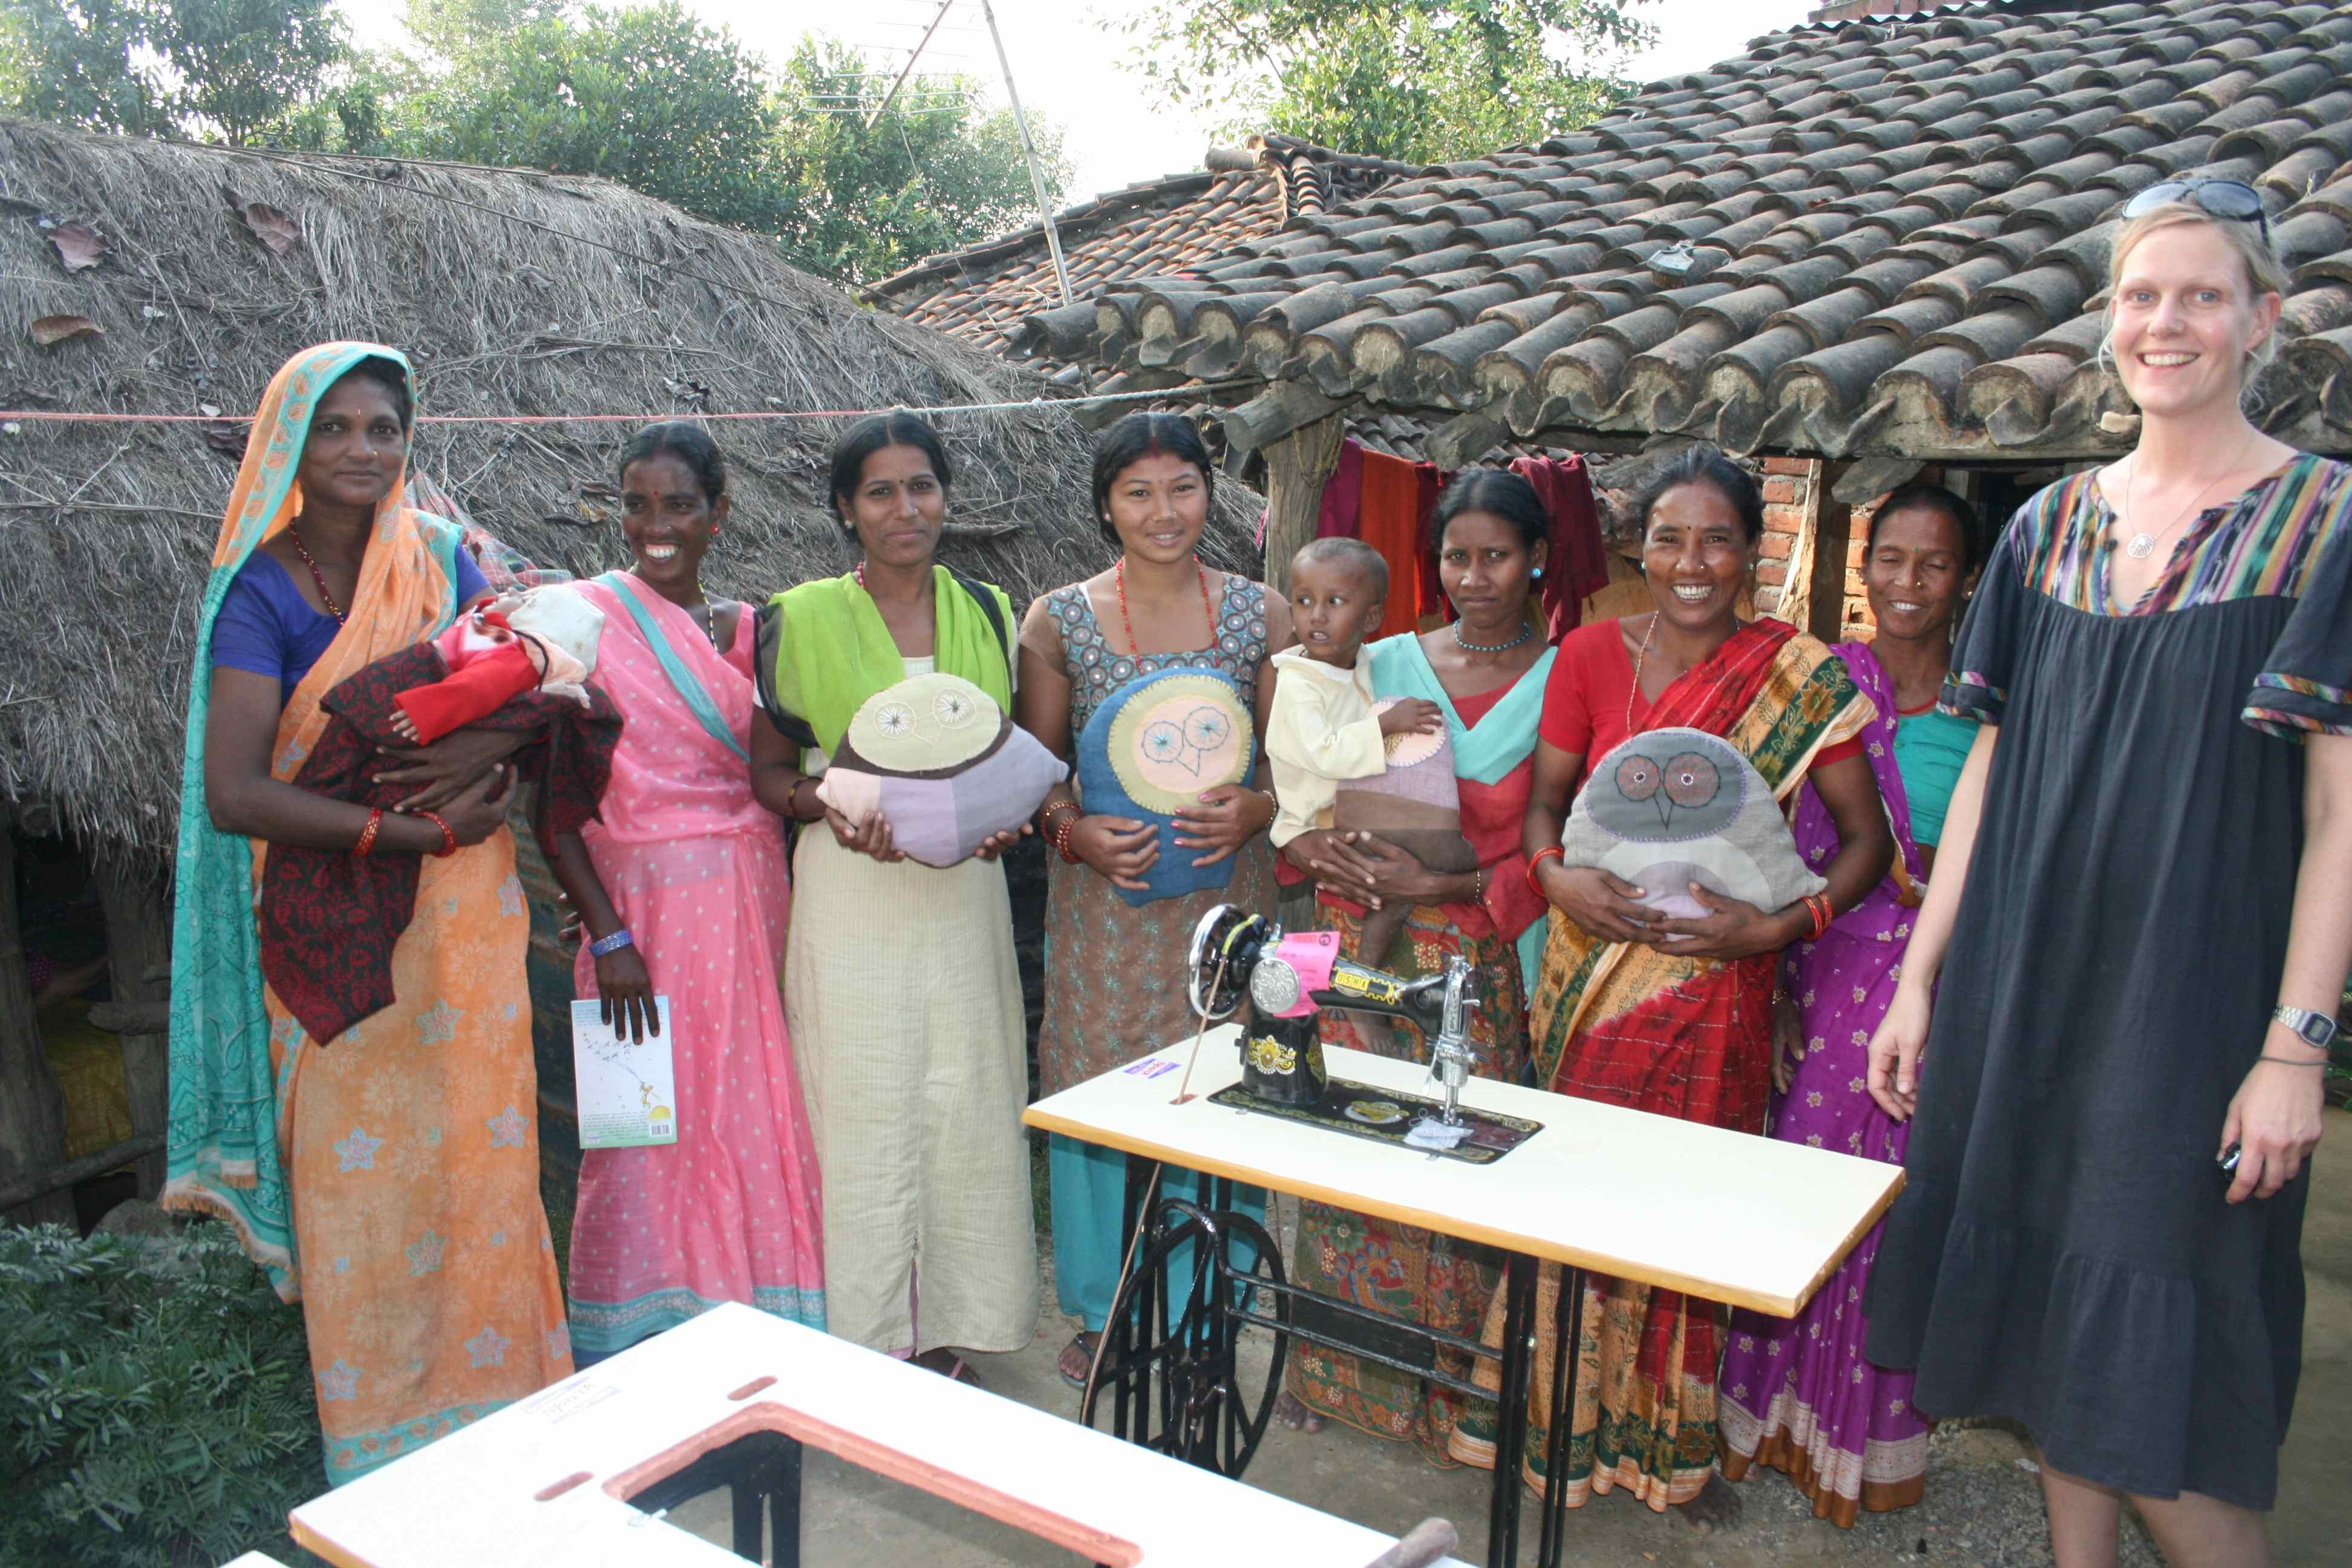 KV med Asha, Bishnu, Sita Chetkala, Laxmi, Sabitri og Shanti